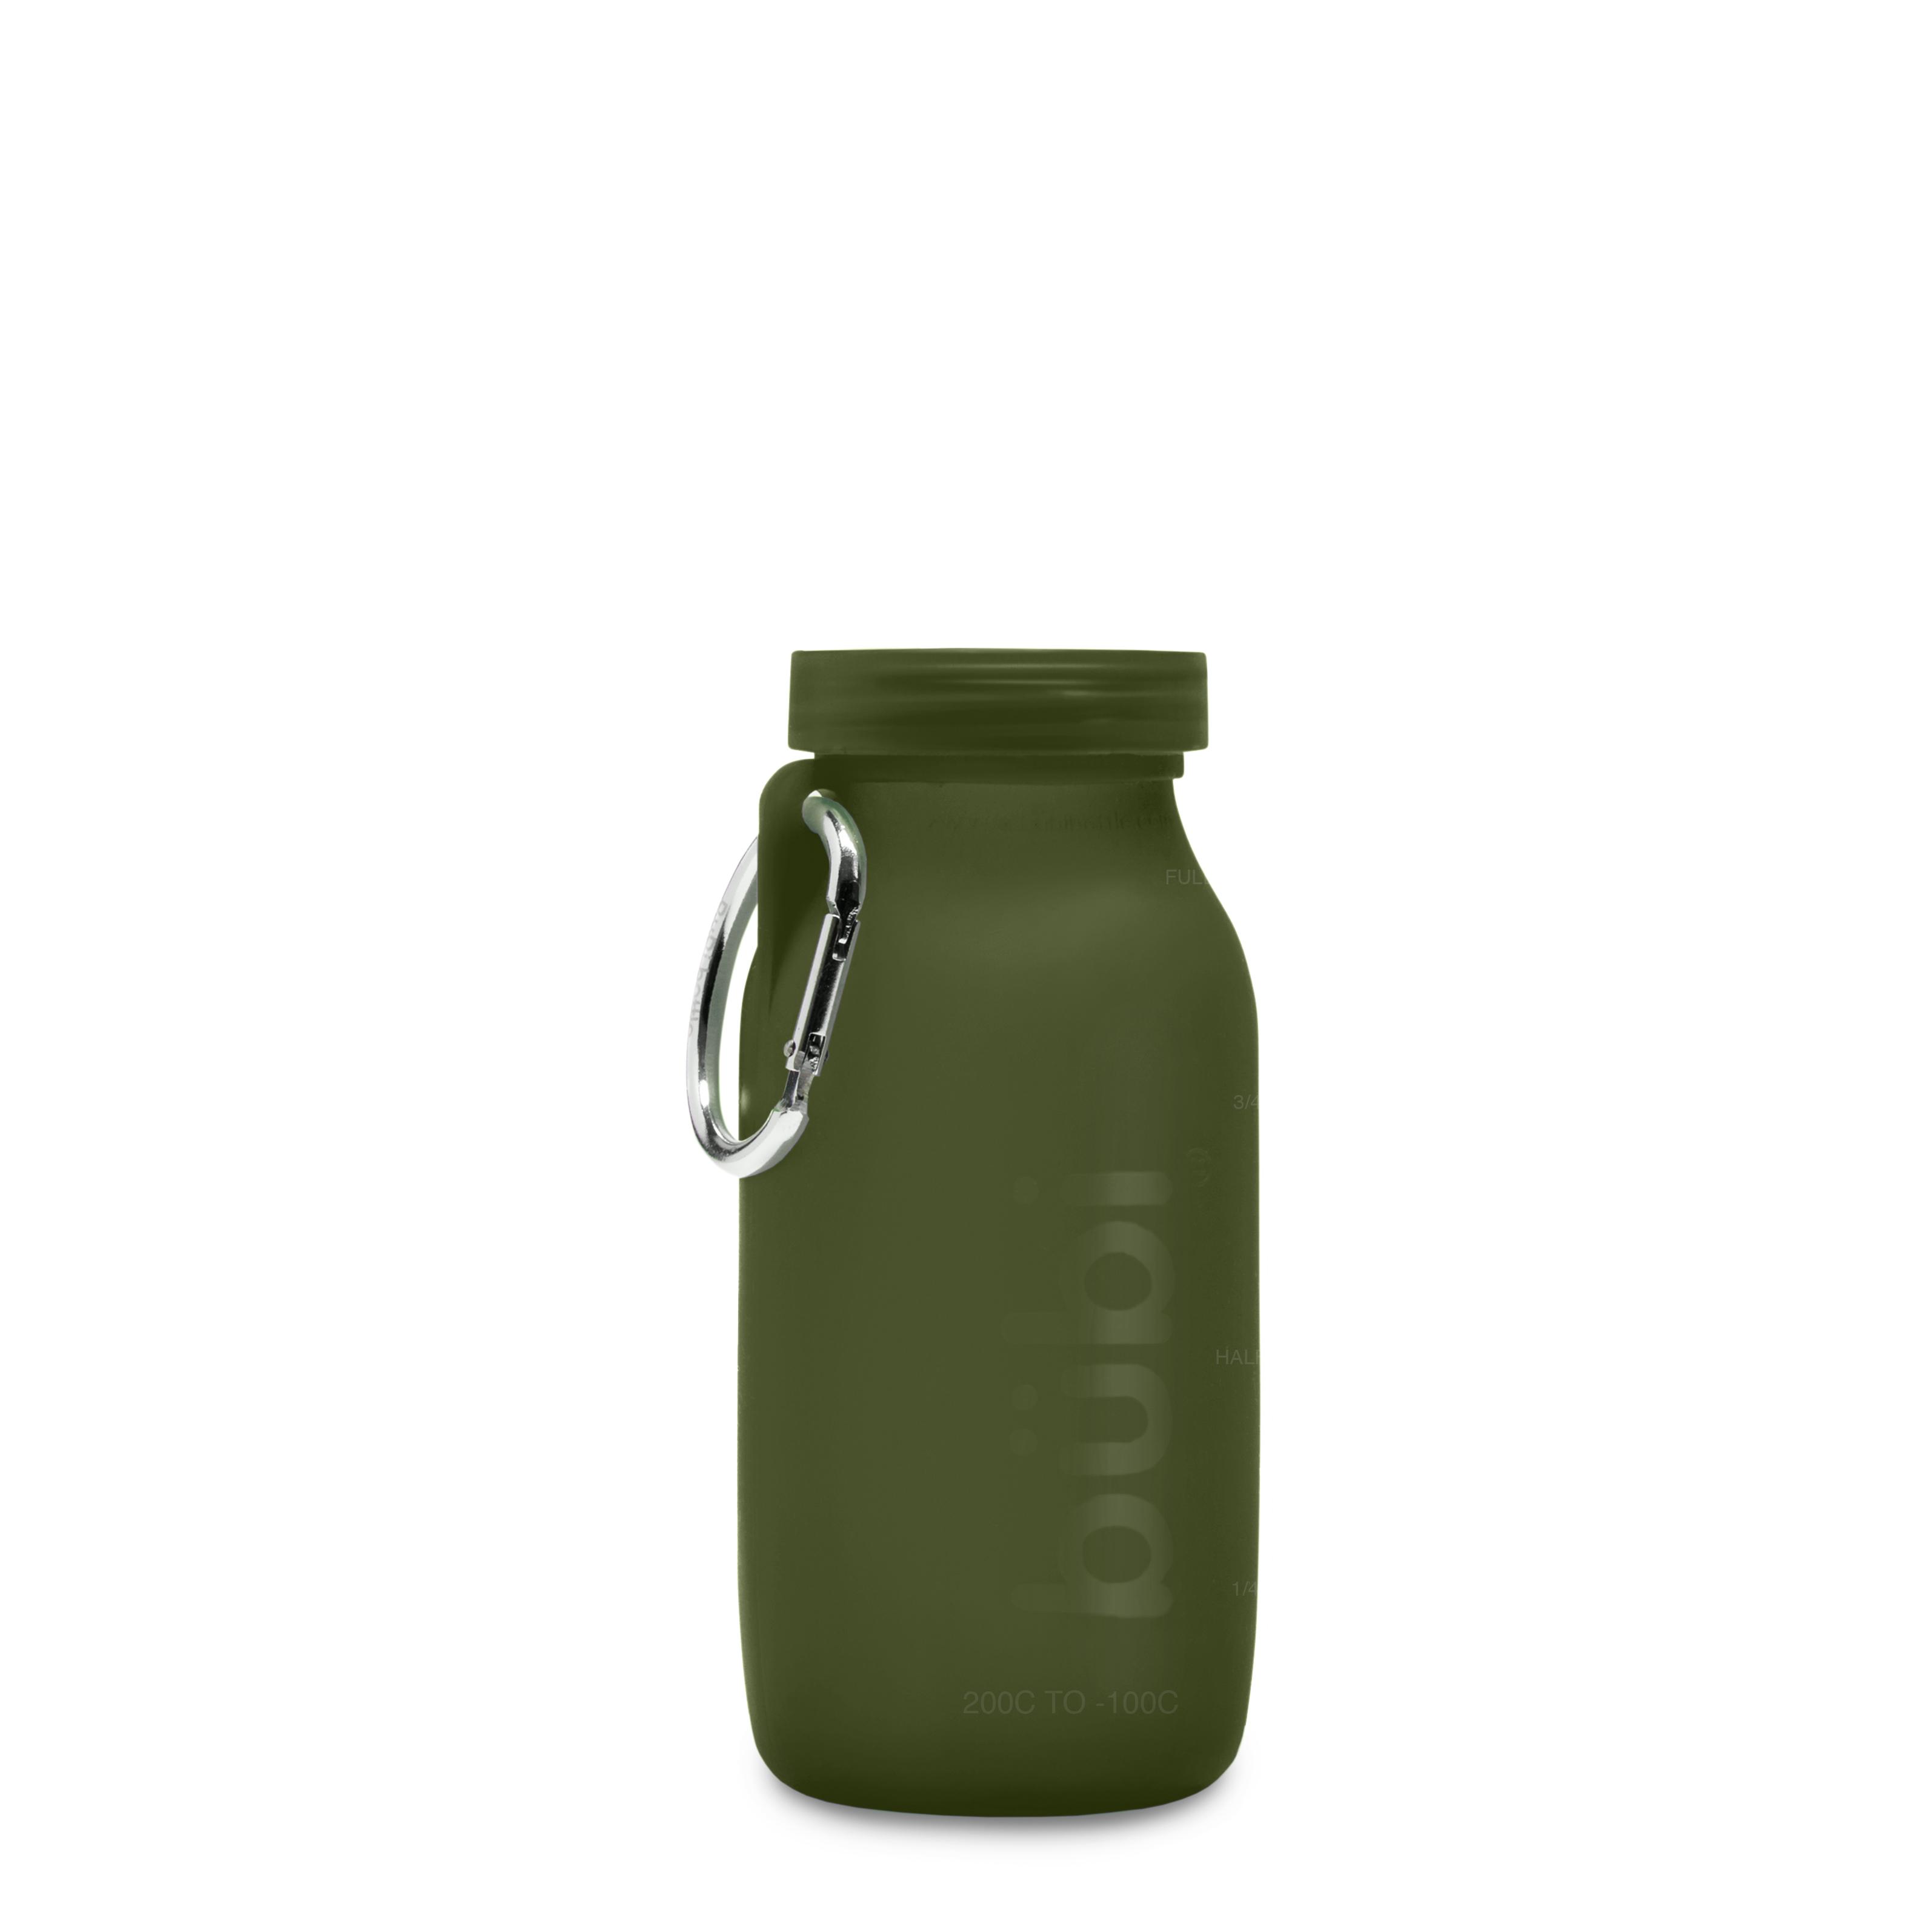 BUBI BOTTLE 矽膠摺疊多功能水壺414ml-海藻綠